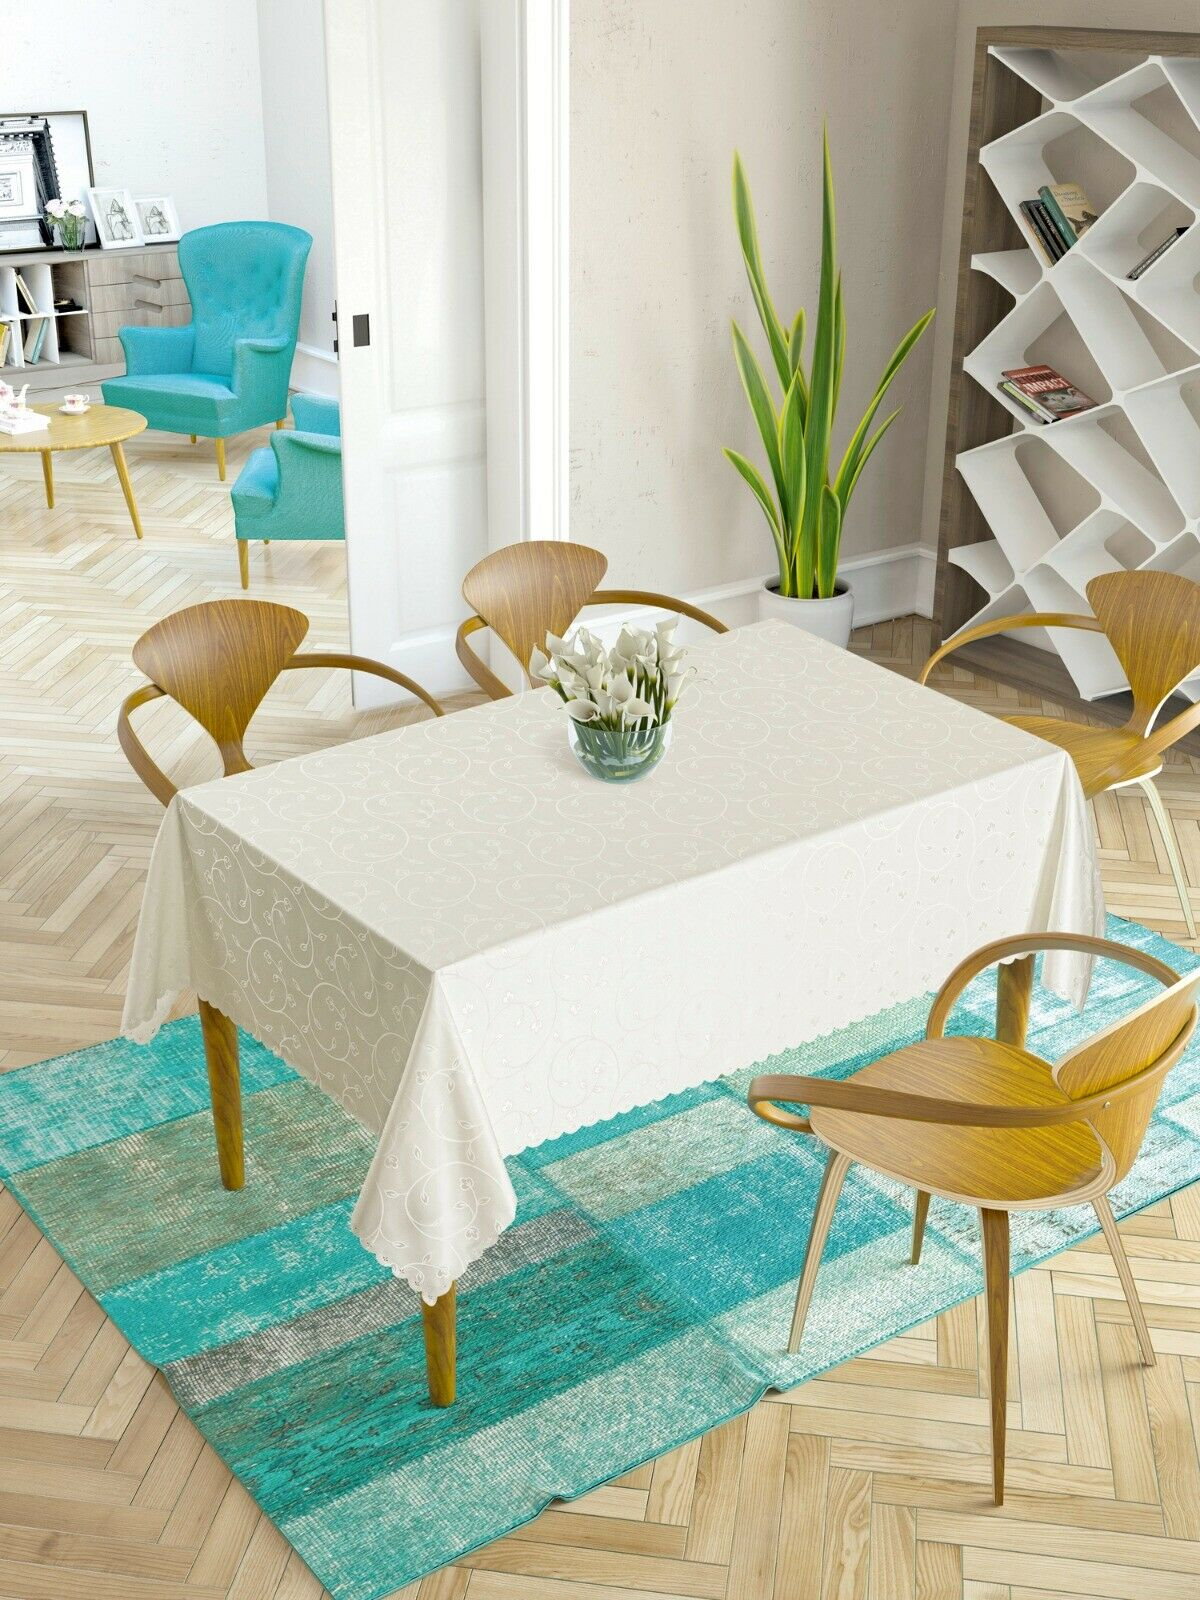 John Lewis Marimekko Unikko Tablecloth X Large 160cm X 320cm For Sale Online Ebay